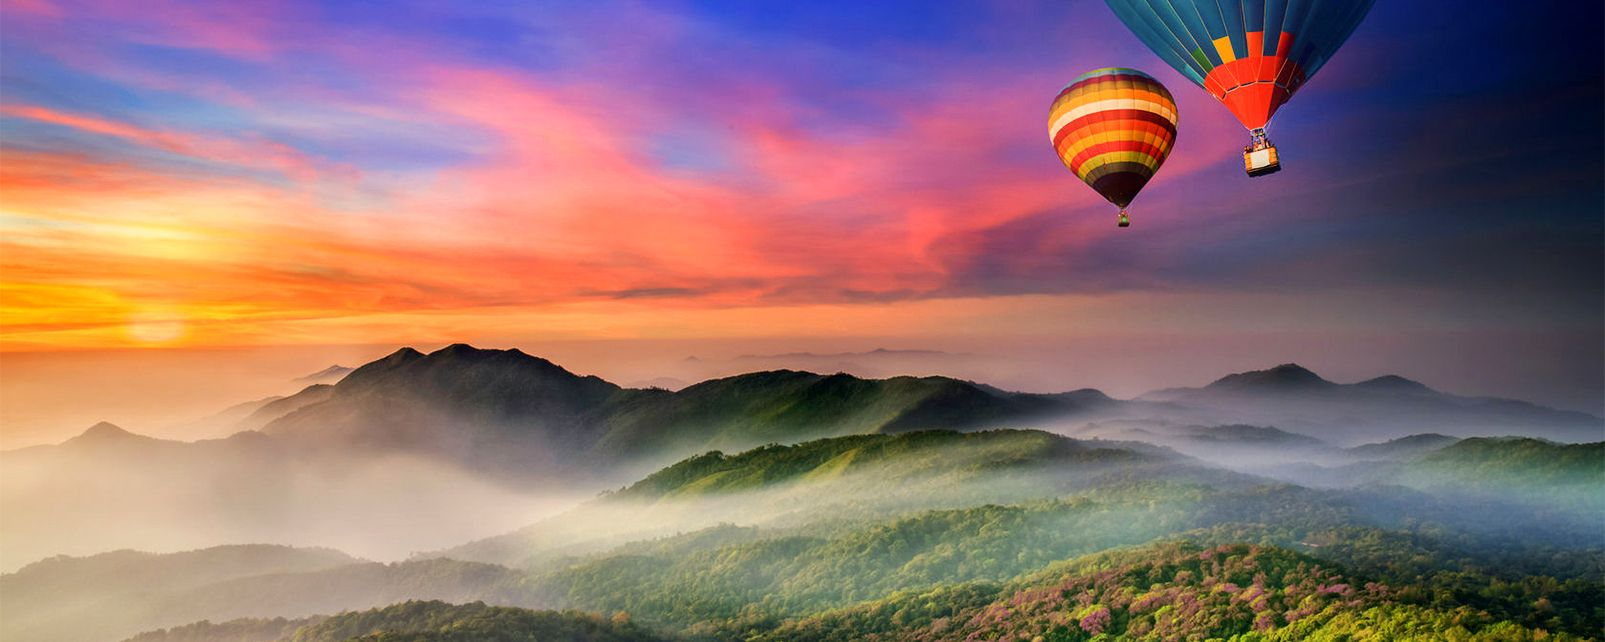 Las montañas, Los paisajes, Tailandia